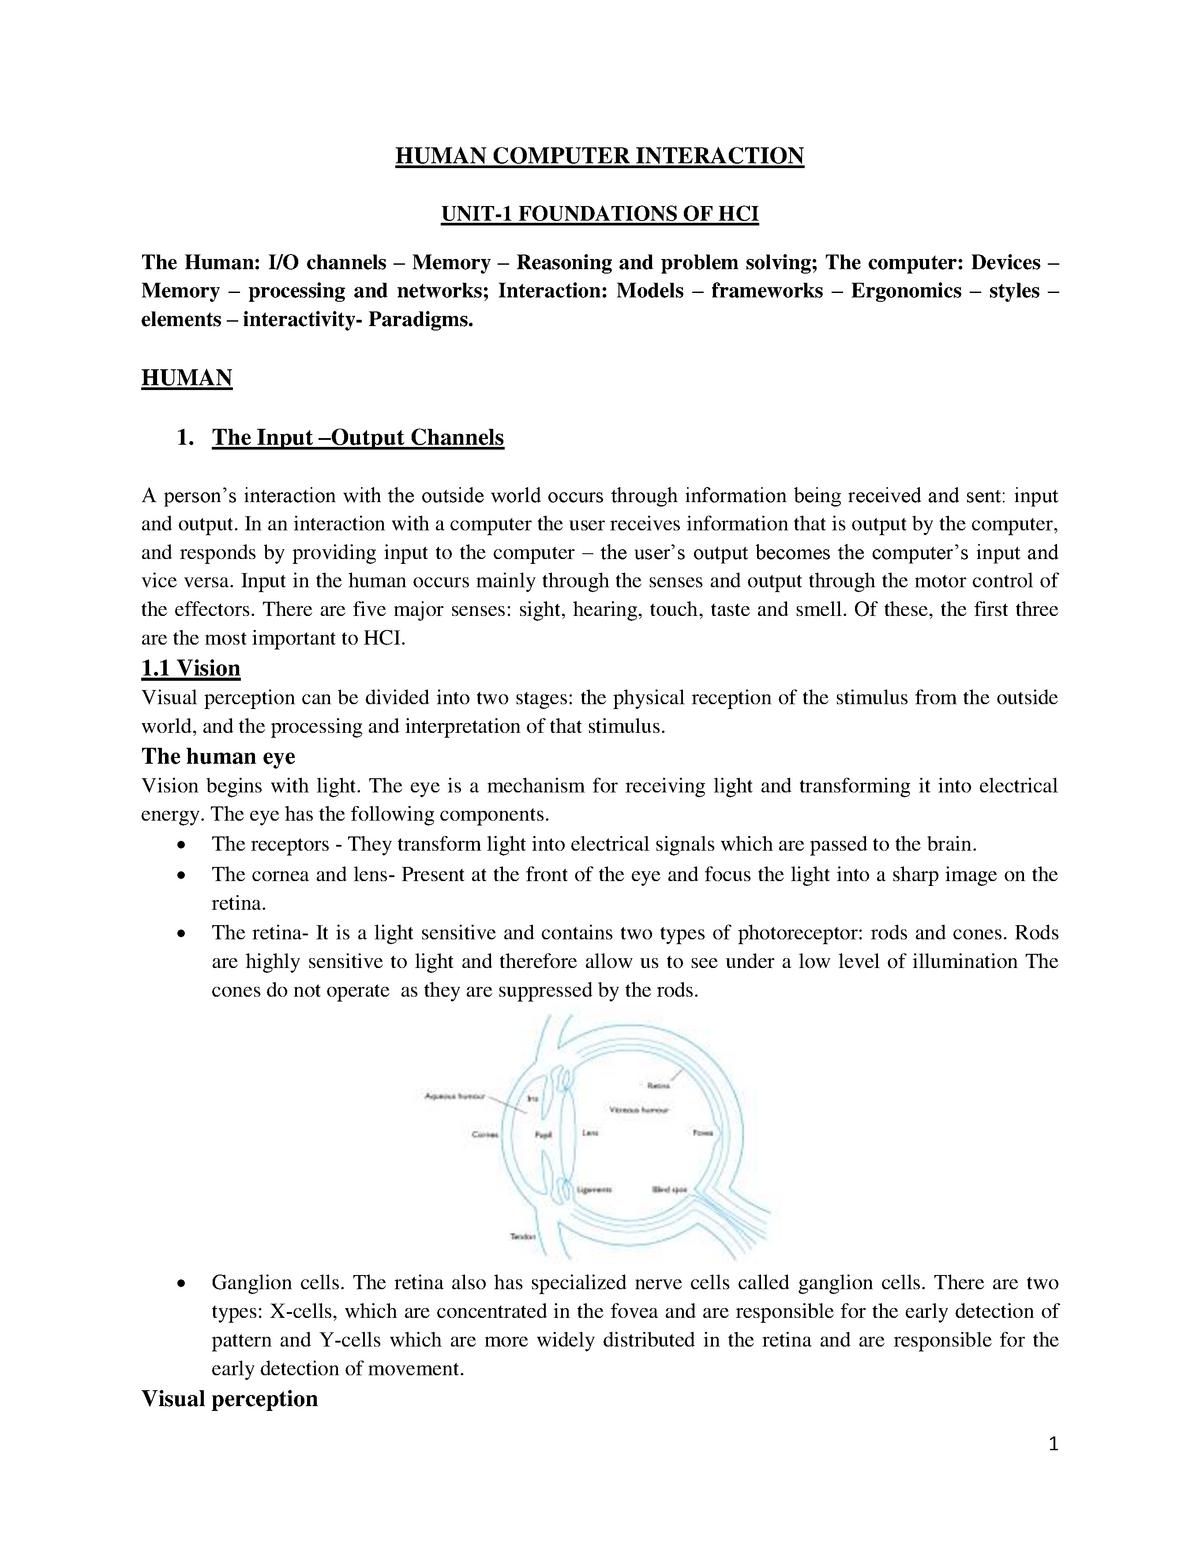 HCI Notes - ALL Units (1) - HUMAN COMPUTER INTERACTION - StuDocu